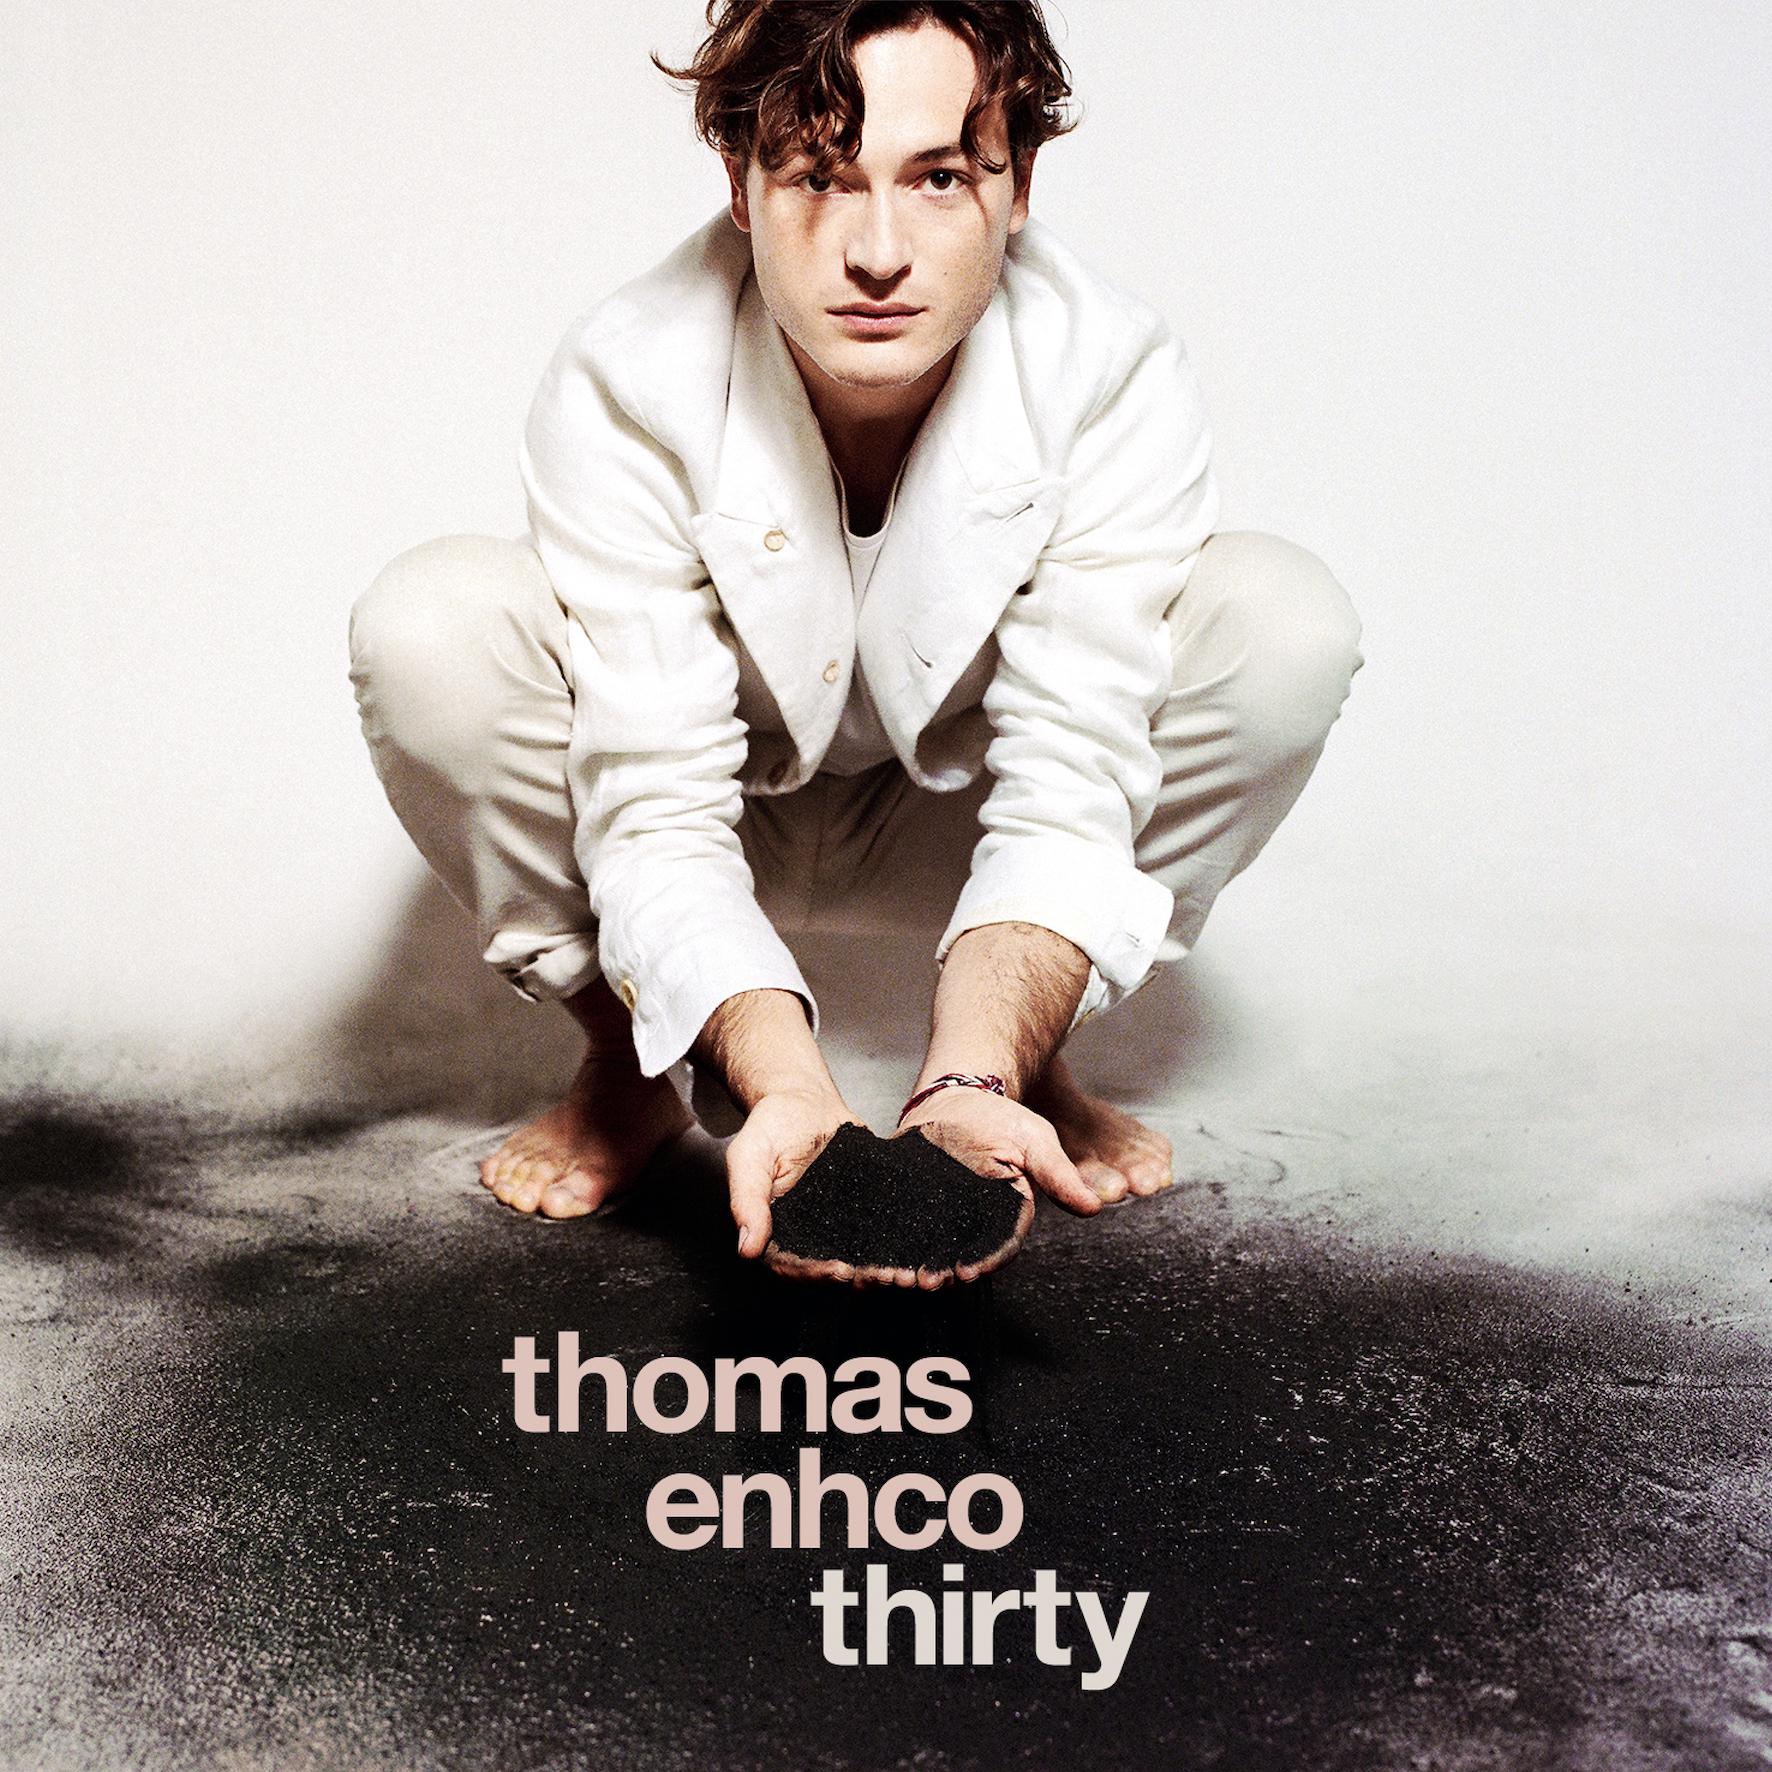 Thomas Enhco solo + symphony orchestra -  Thirty  (2019)